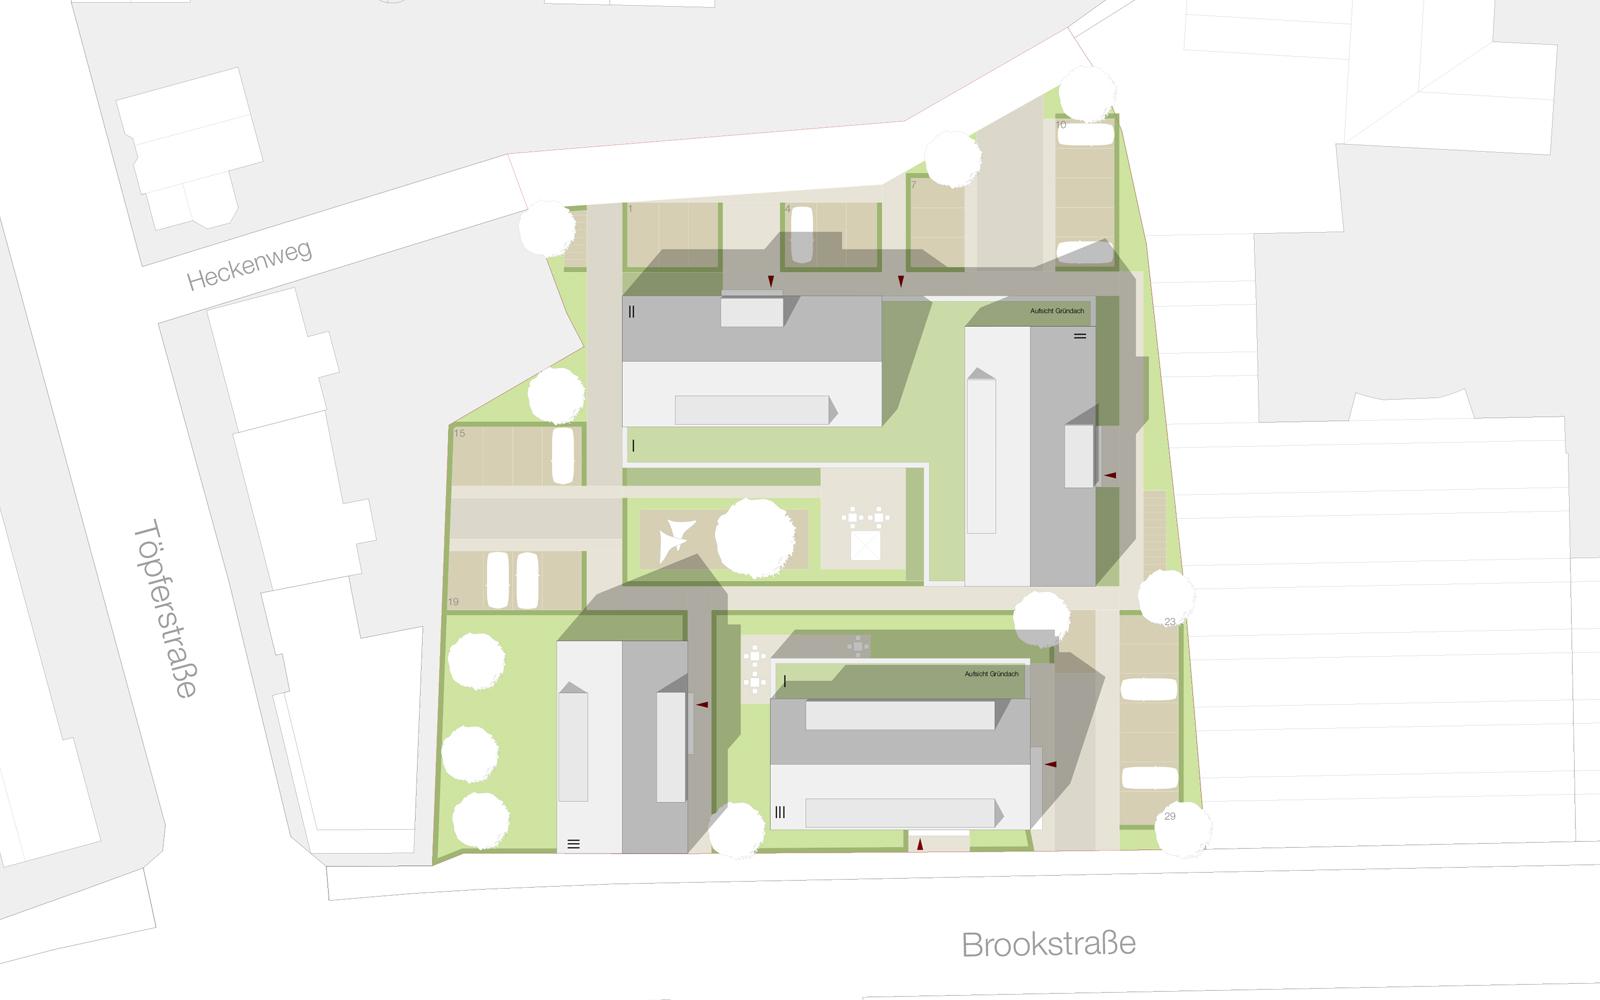 Entwurf Quartier Brookstraße